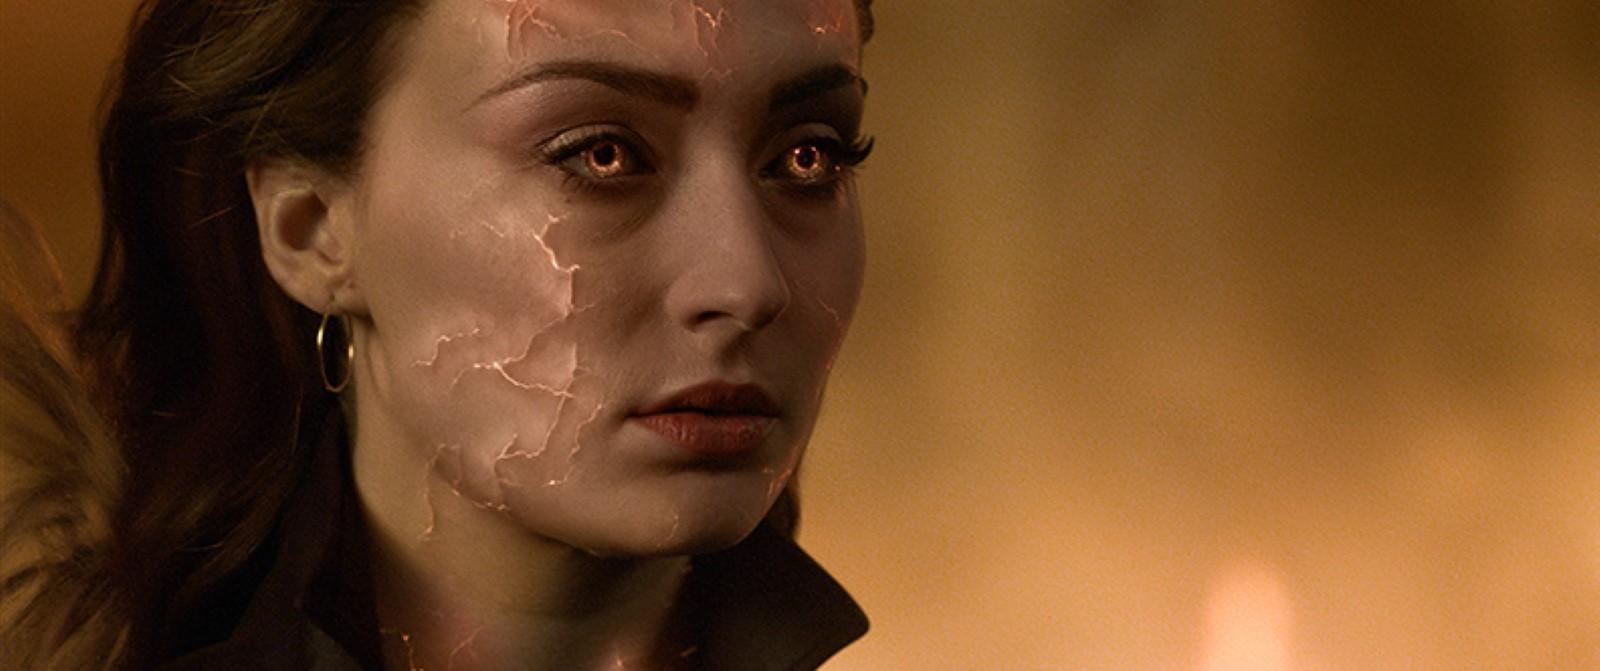 Sophie Turner en X-Men: Fénix Oscura